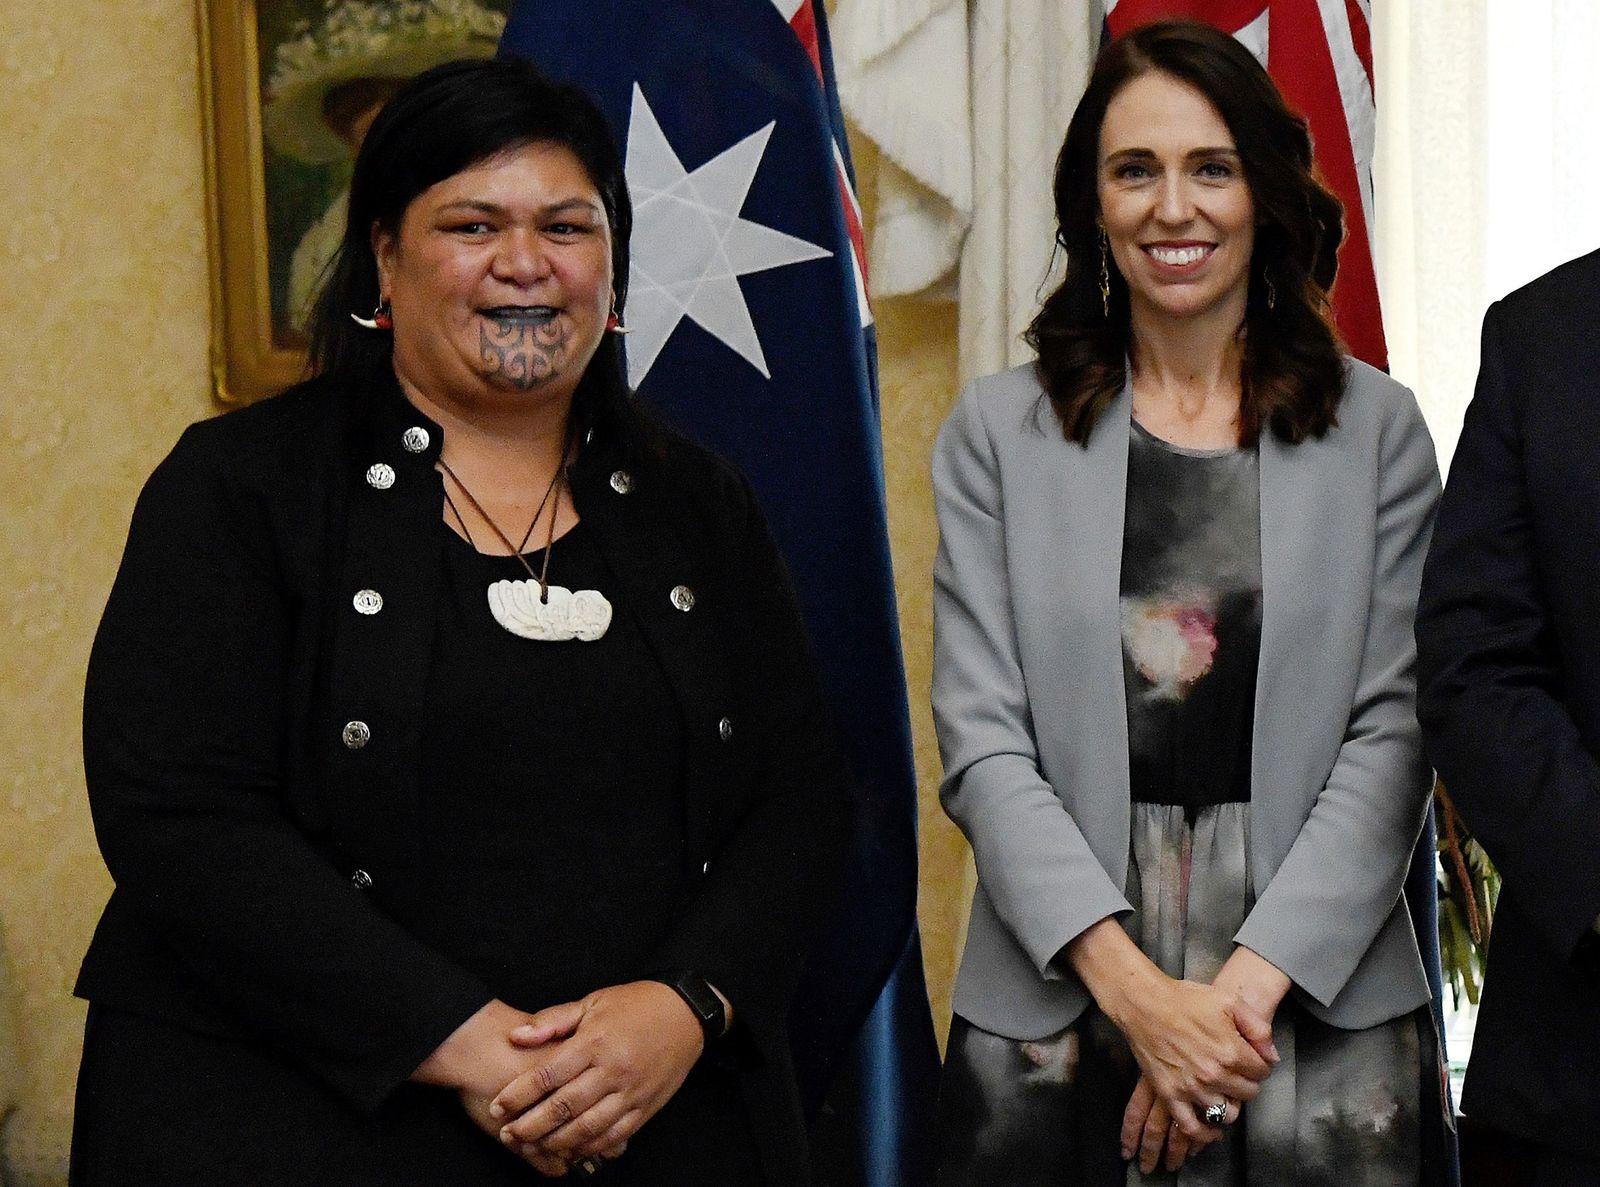 FILES-NZEALAND-POLITICS-HOMOSEXUALITY-DIPLOMACY-INDIGENOUS-MINIS